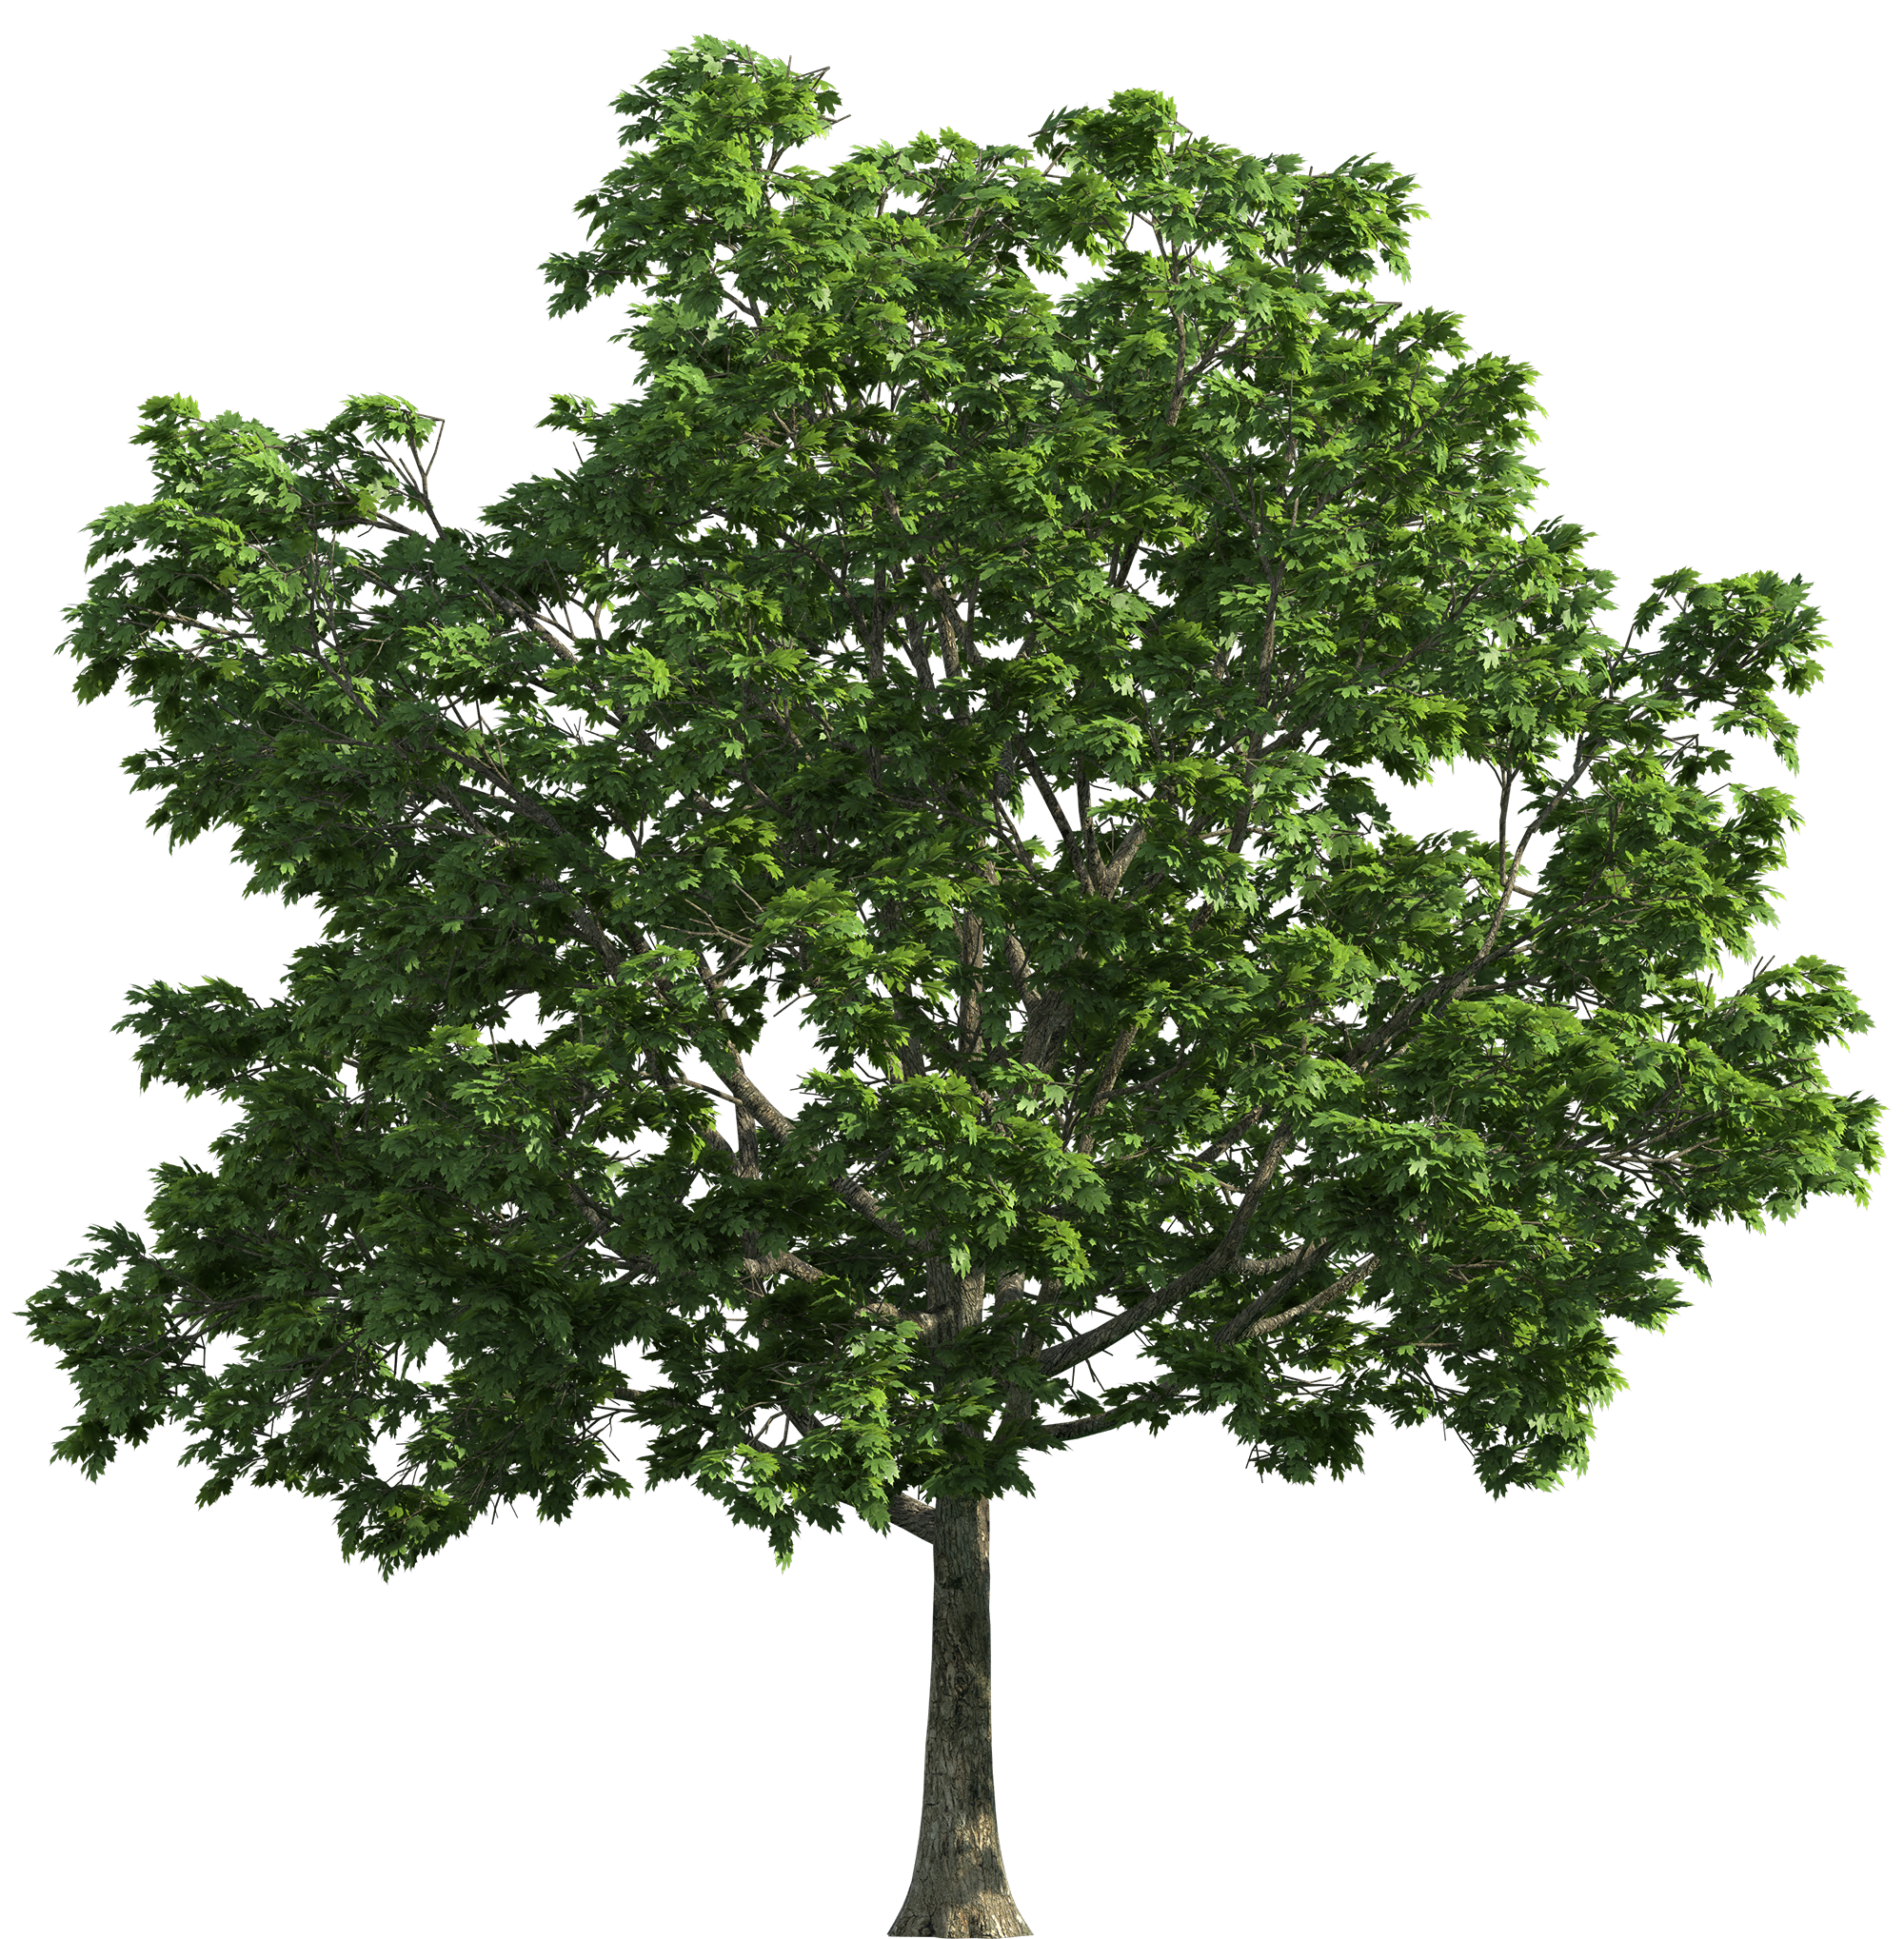 Walnut tree clipart banner freeuse download Tree_Transparent_PNG_Clip_Art-1108.png (2000×2037) | Tree_alpha ... banner freeuse download